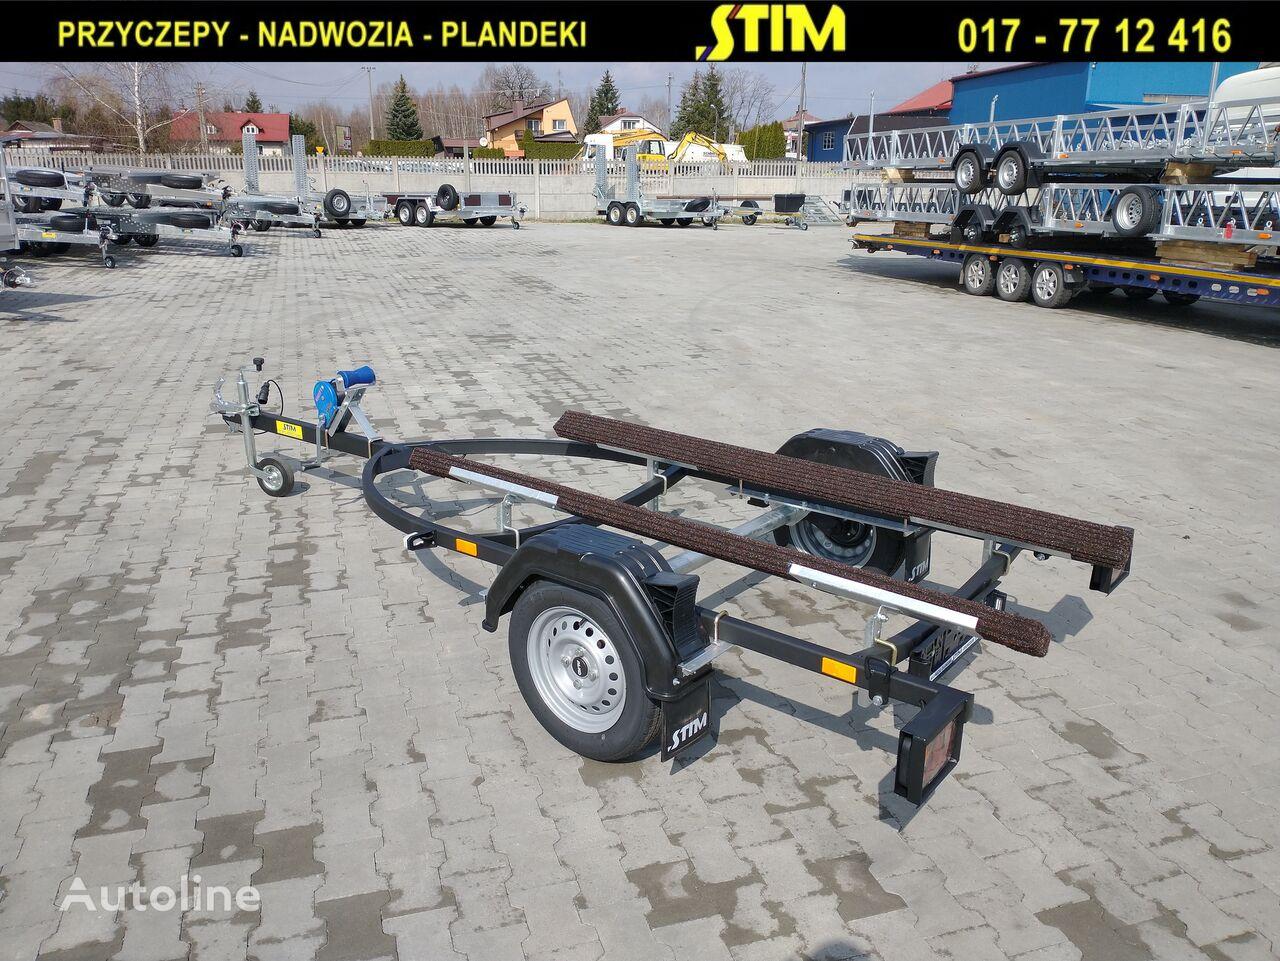 new STIM L11  boat trailer